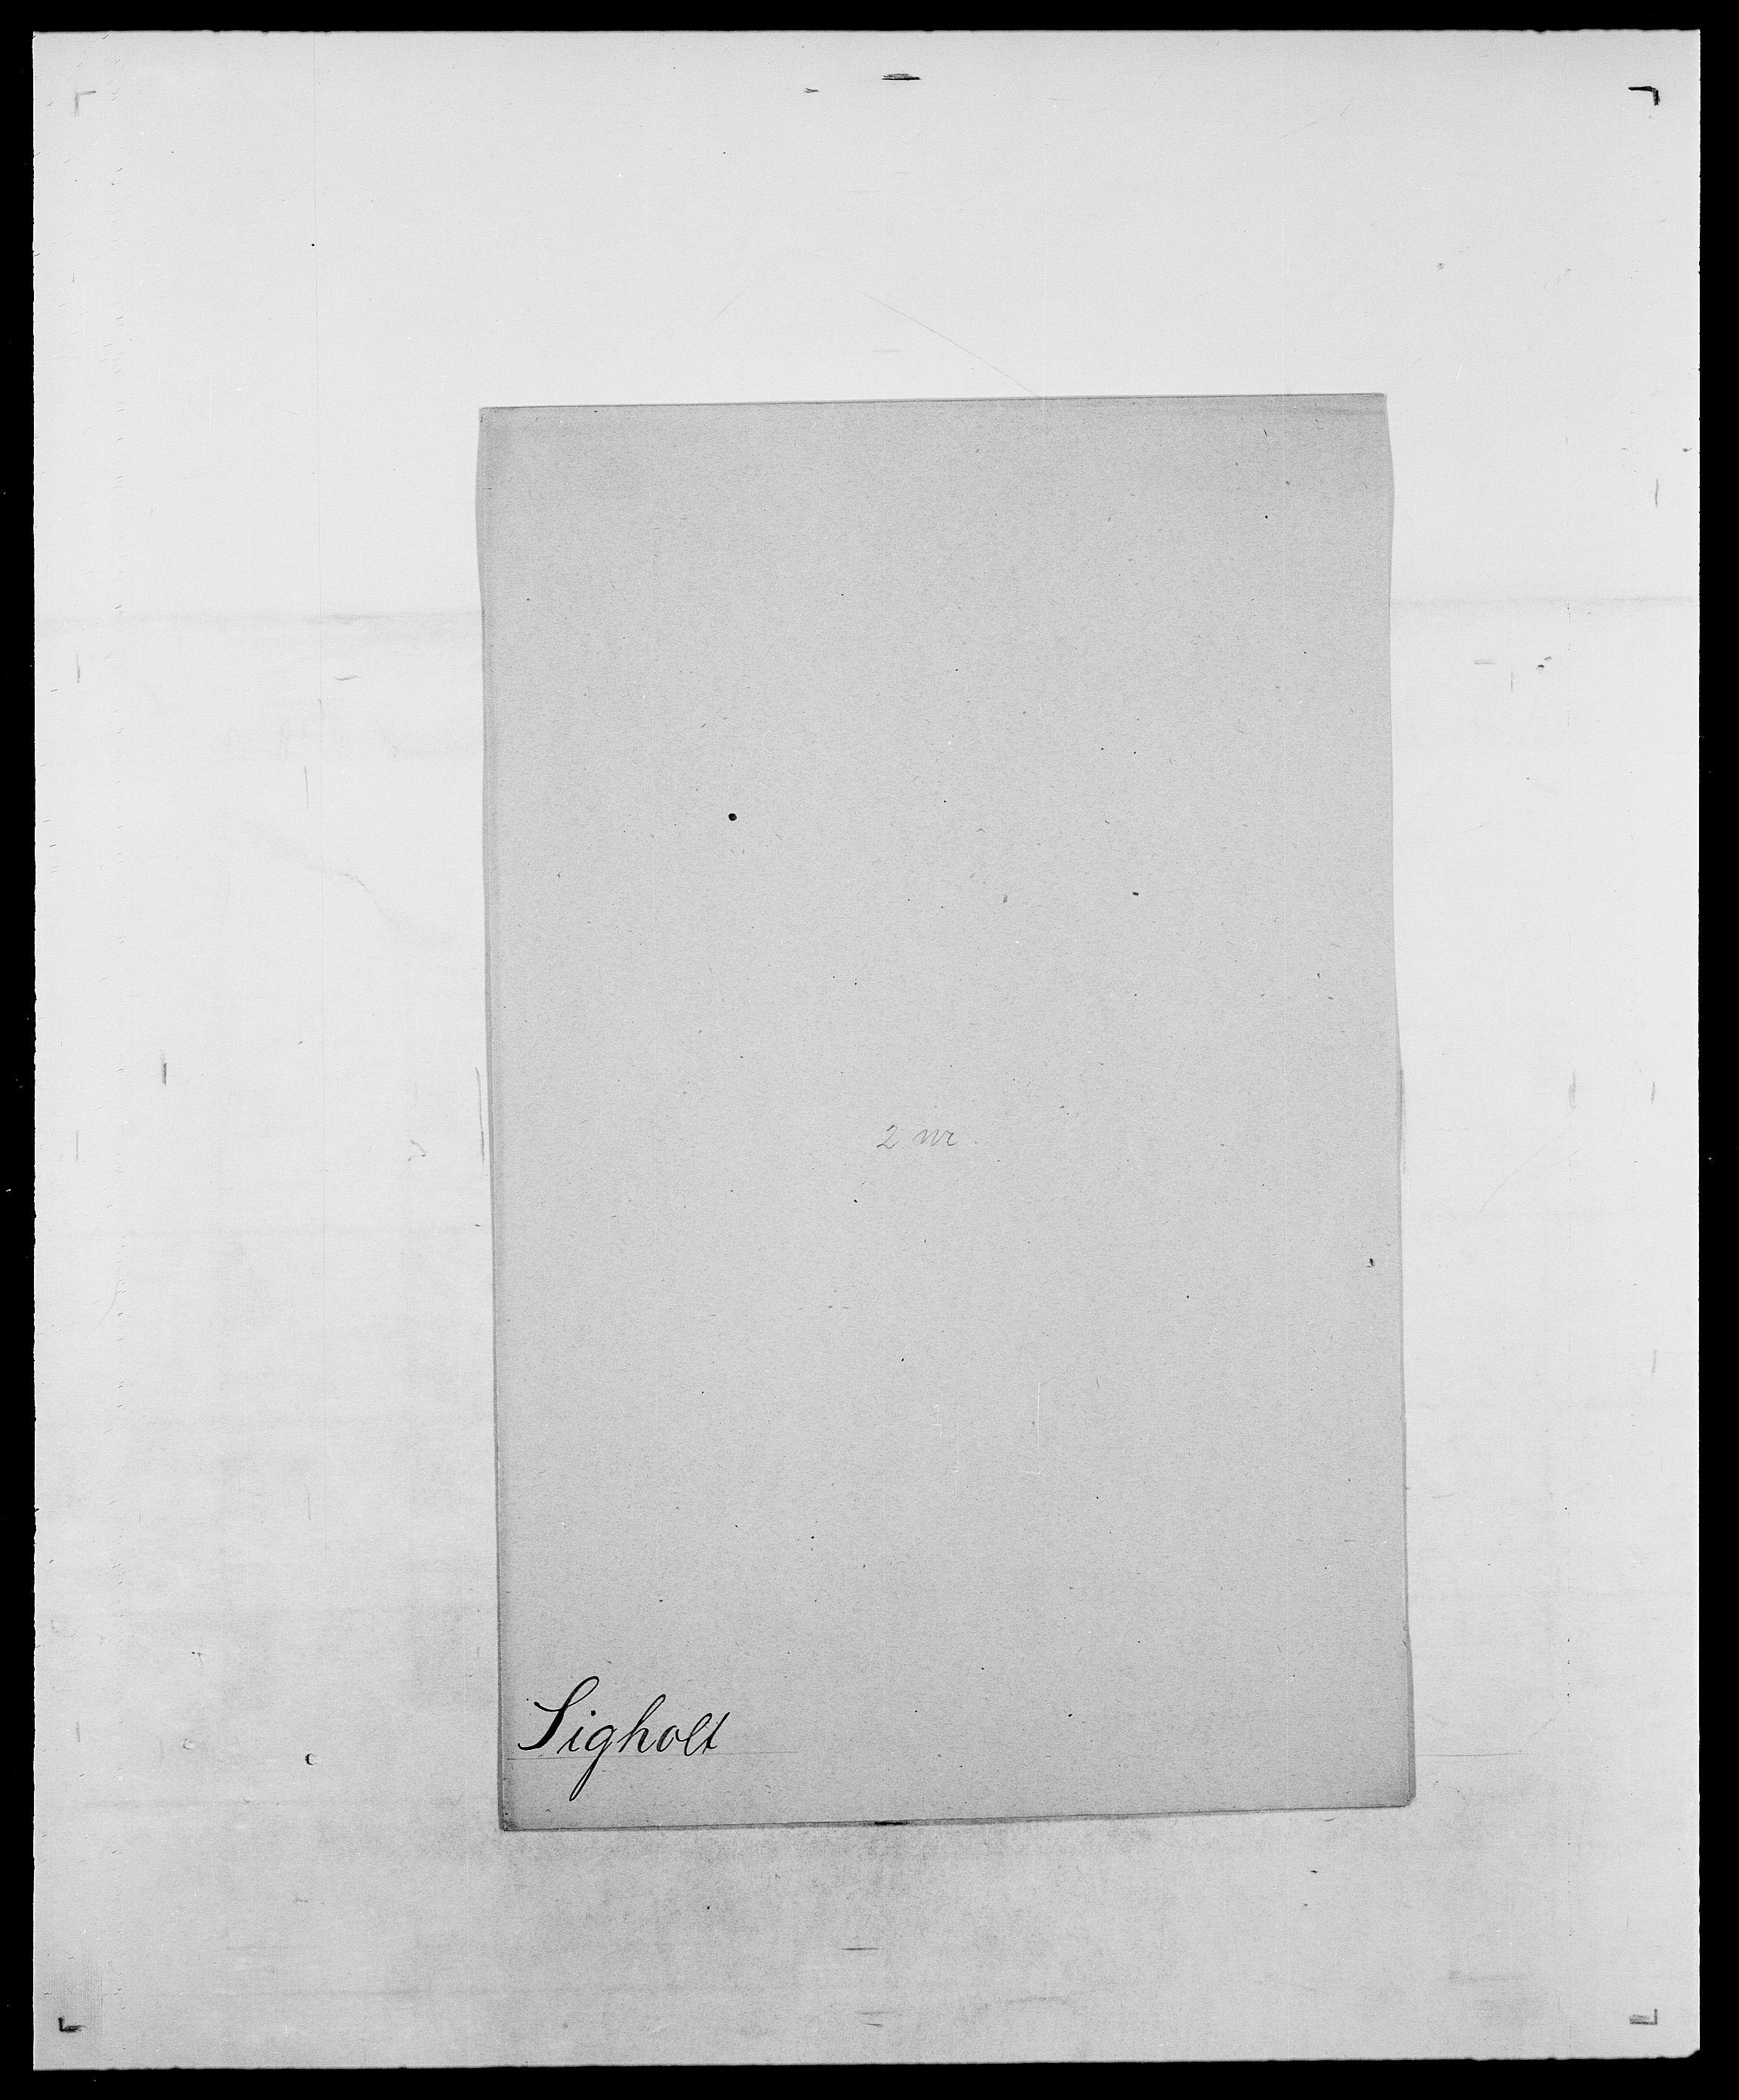 SAO, Delgobe, Charles Antoine - samling, D/Da/L0035: Schnabel - sjetman, s. 784